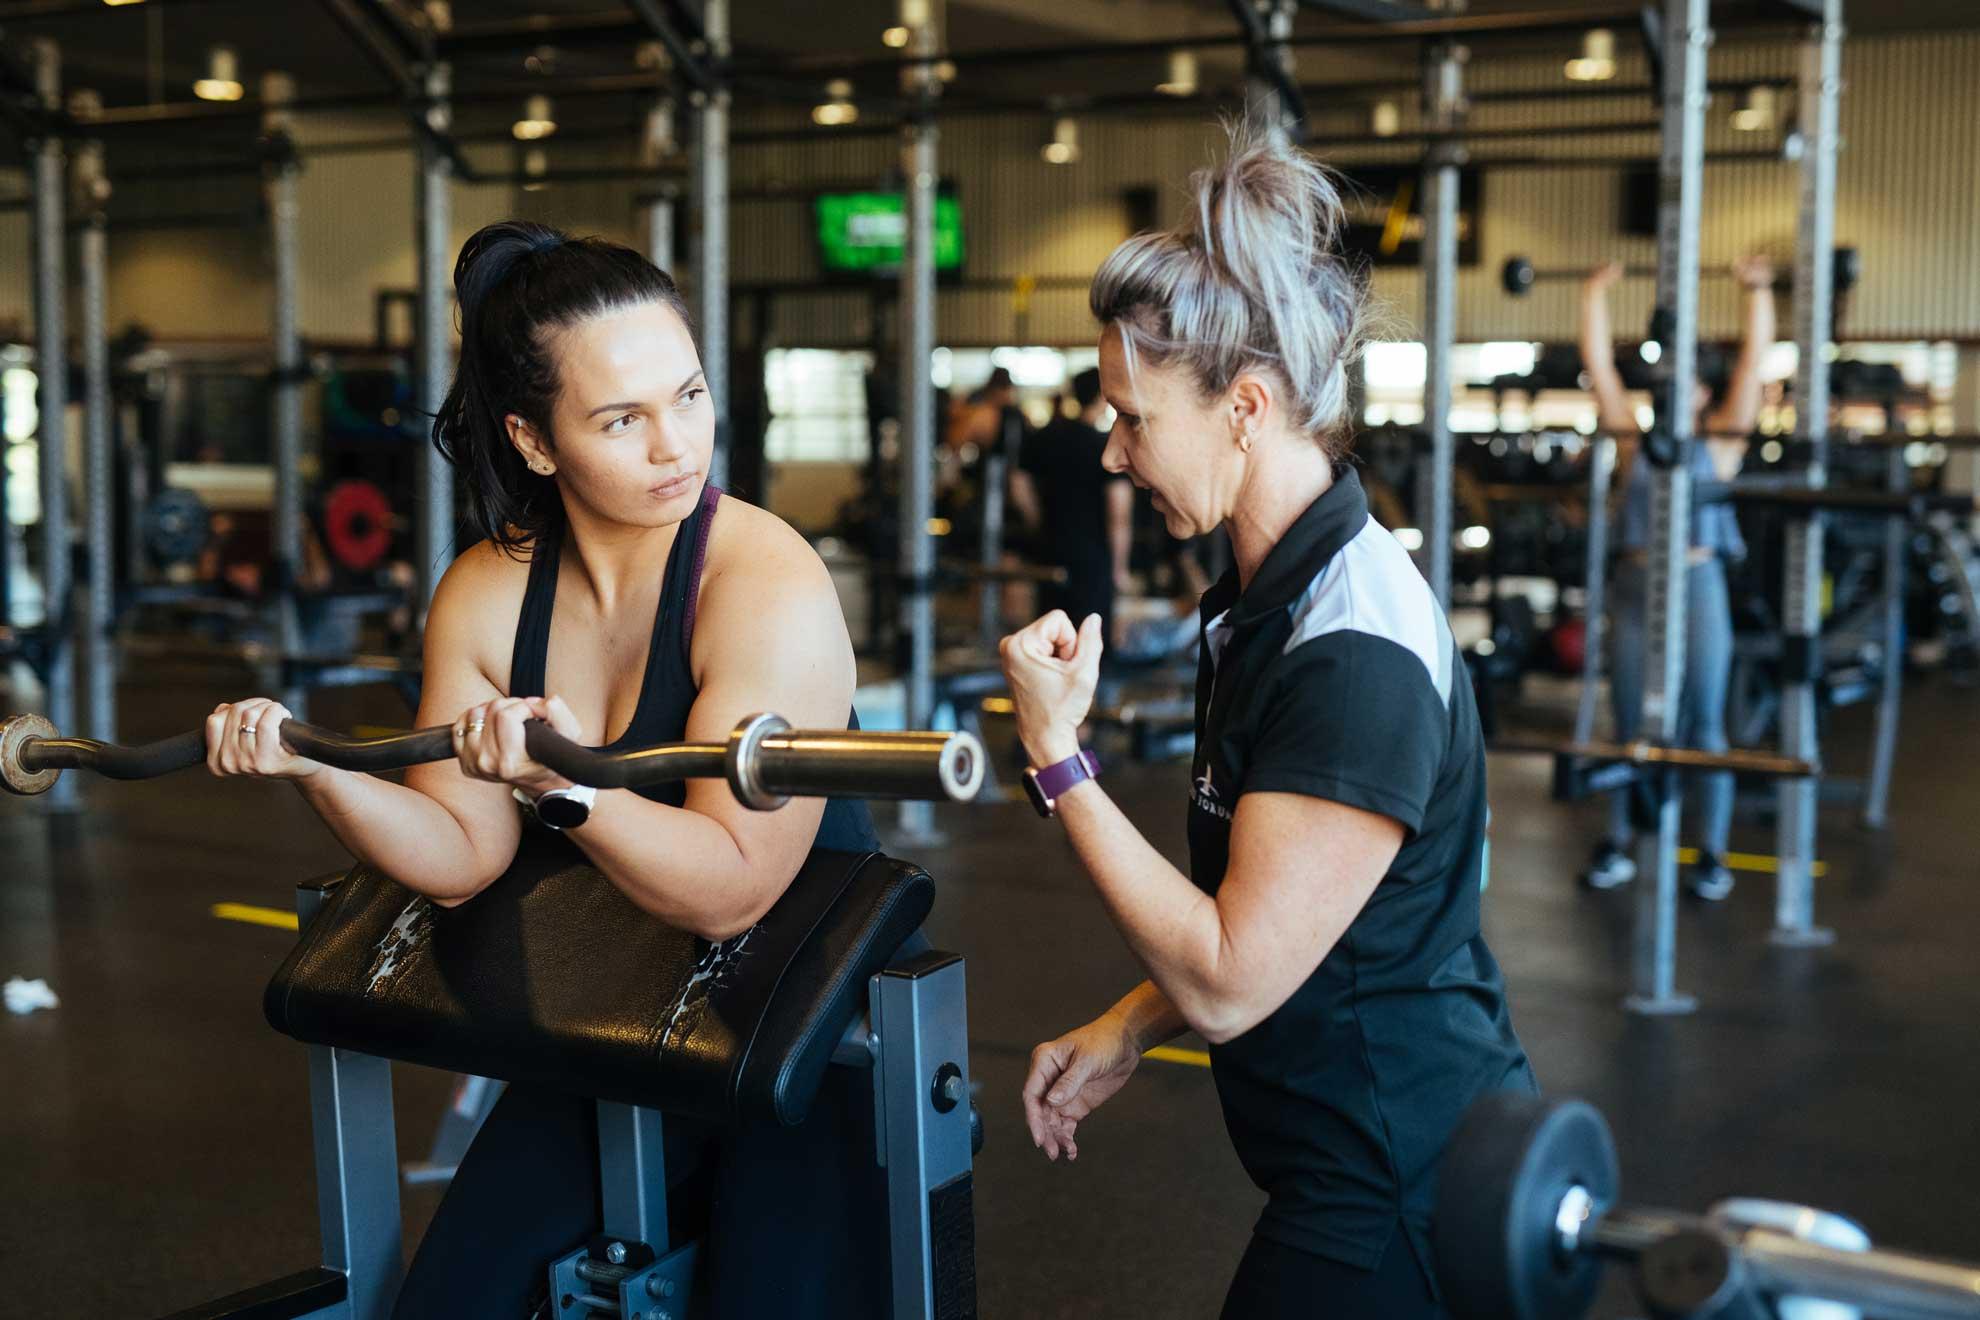 benefits-of-strength-training